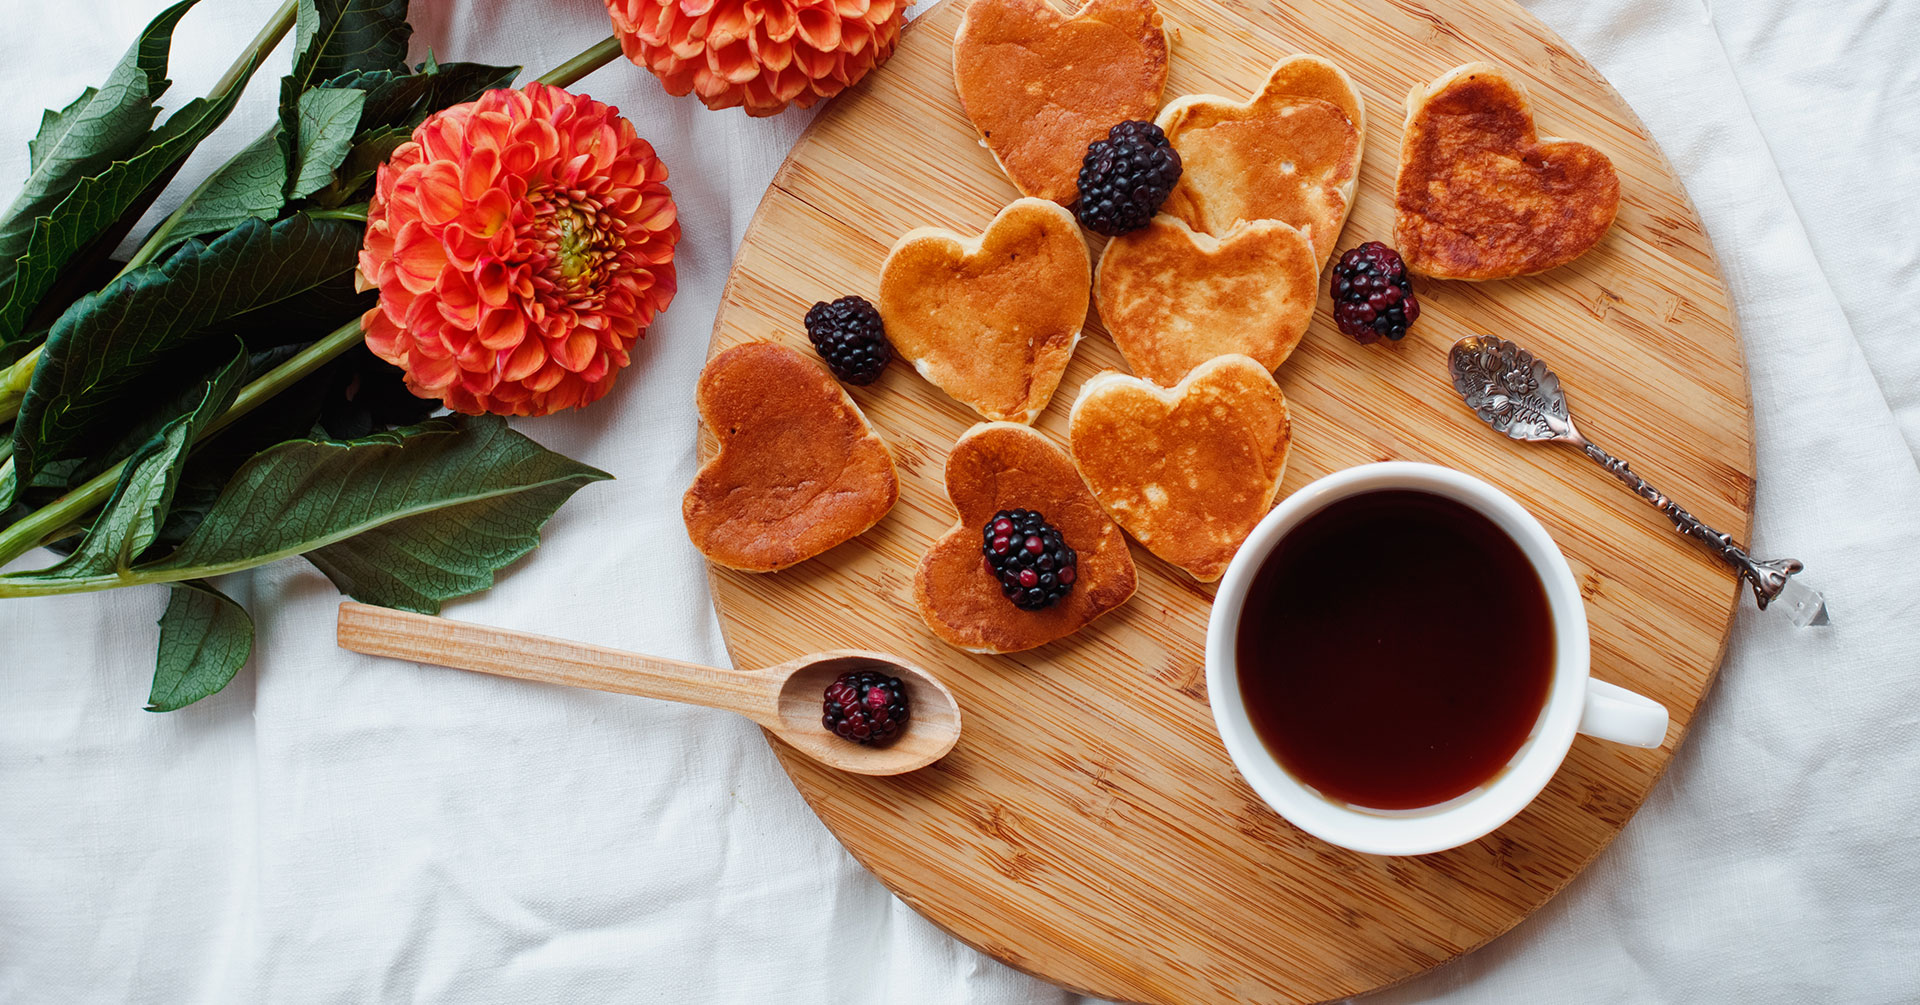 Hot cakes con forma de corazón